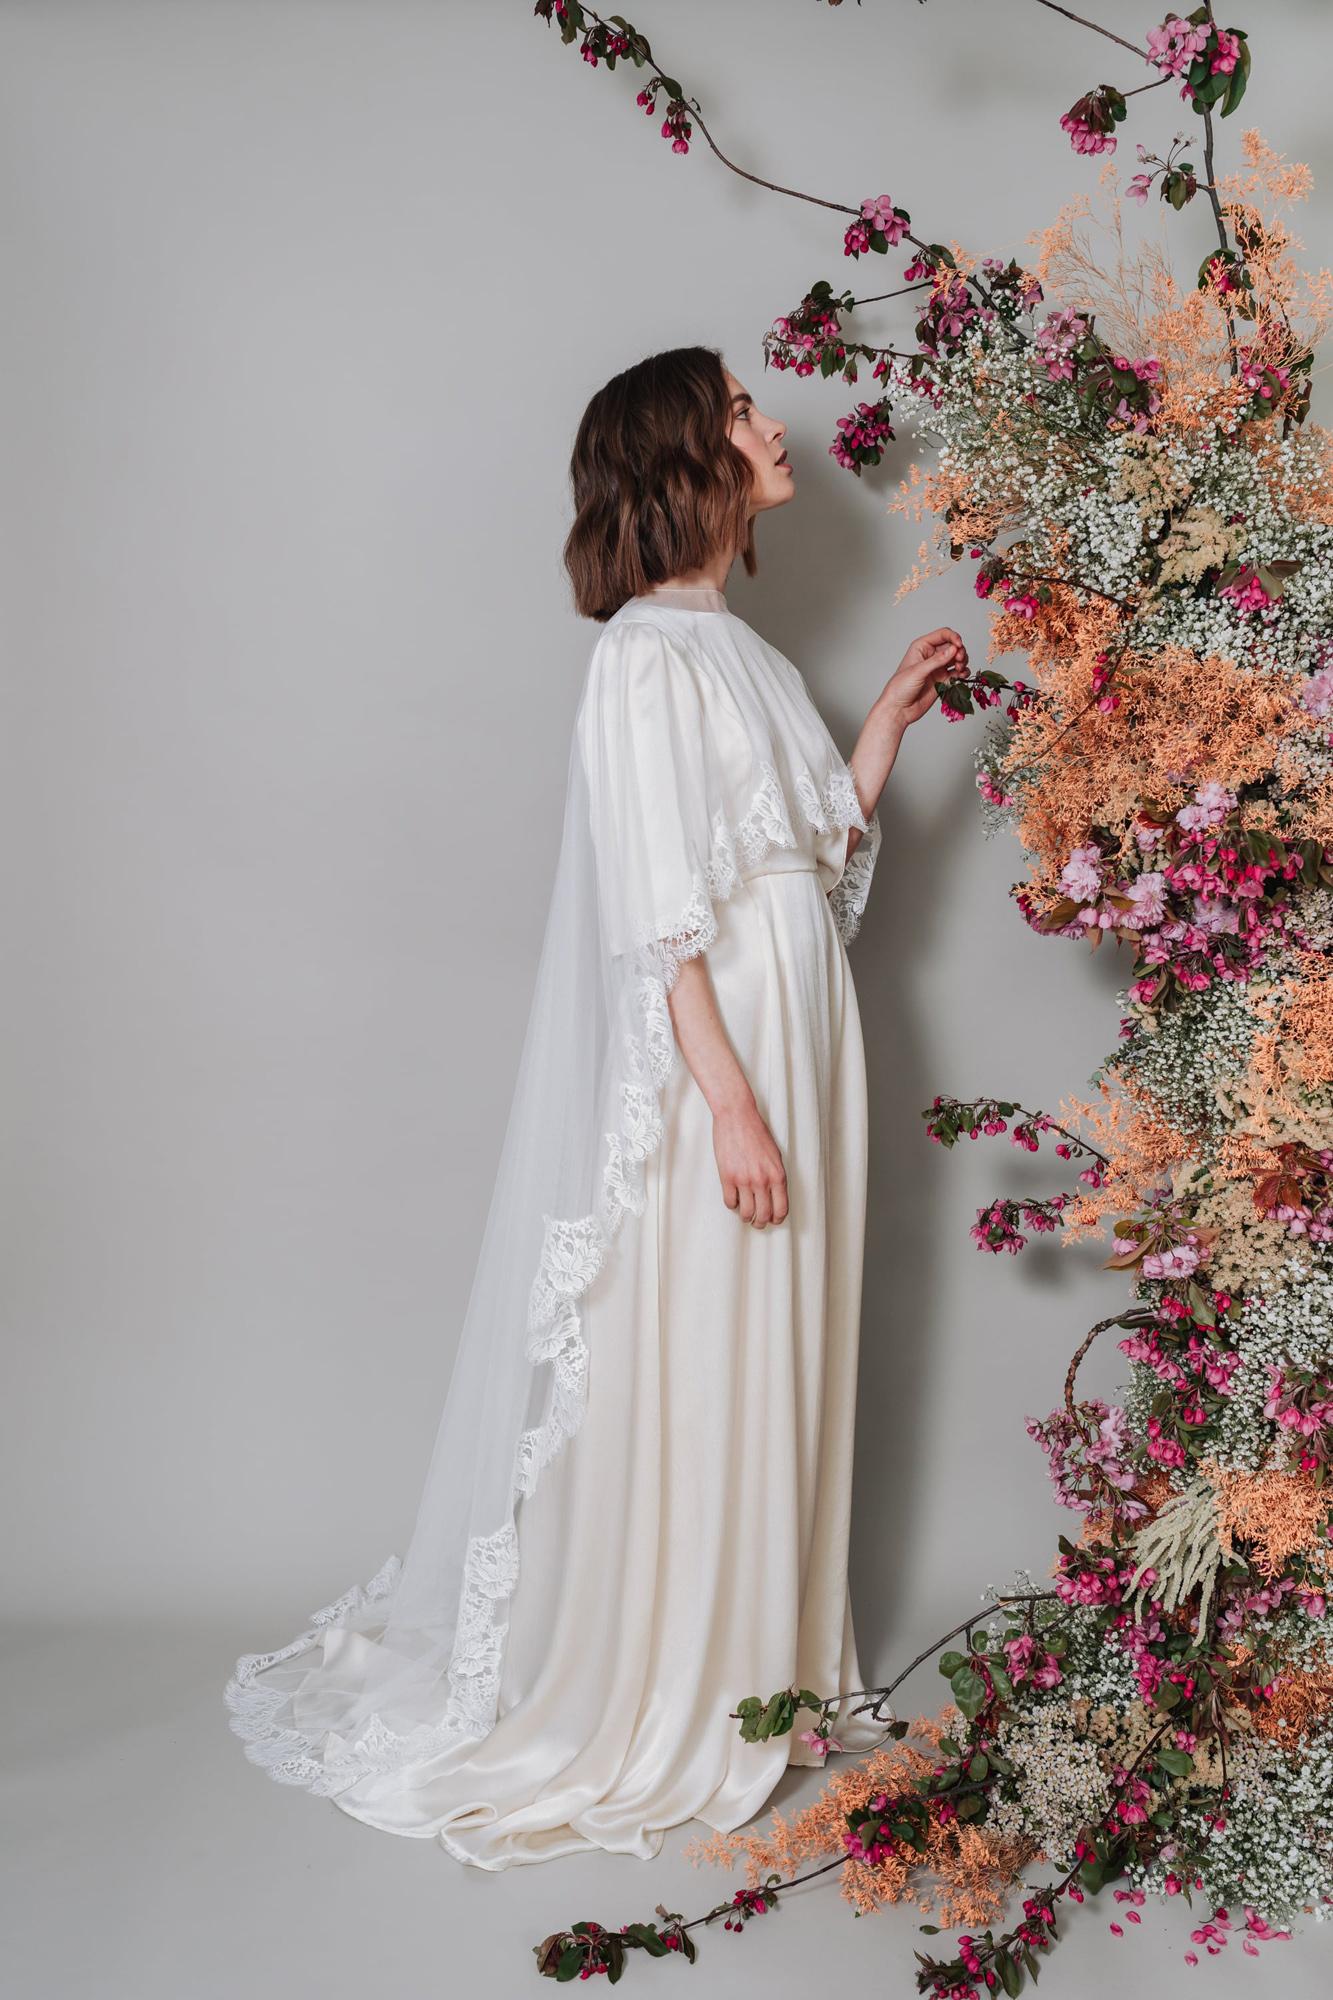 Kate-Beaumont-Lunaria-Bohemian-Hammered-Silk-Wedding-Dress-Sleeves-13.jpg